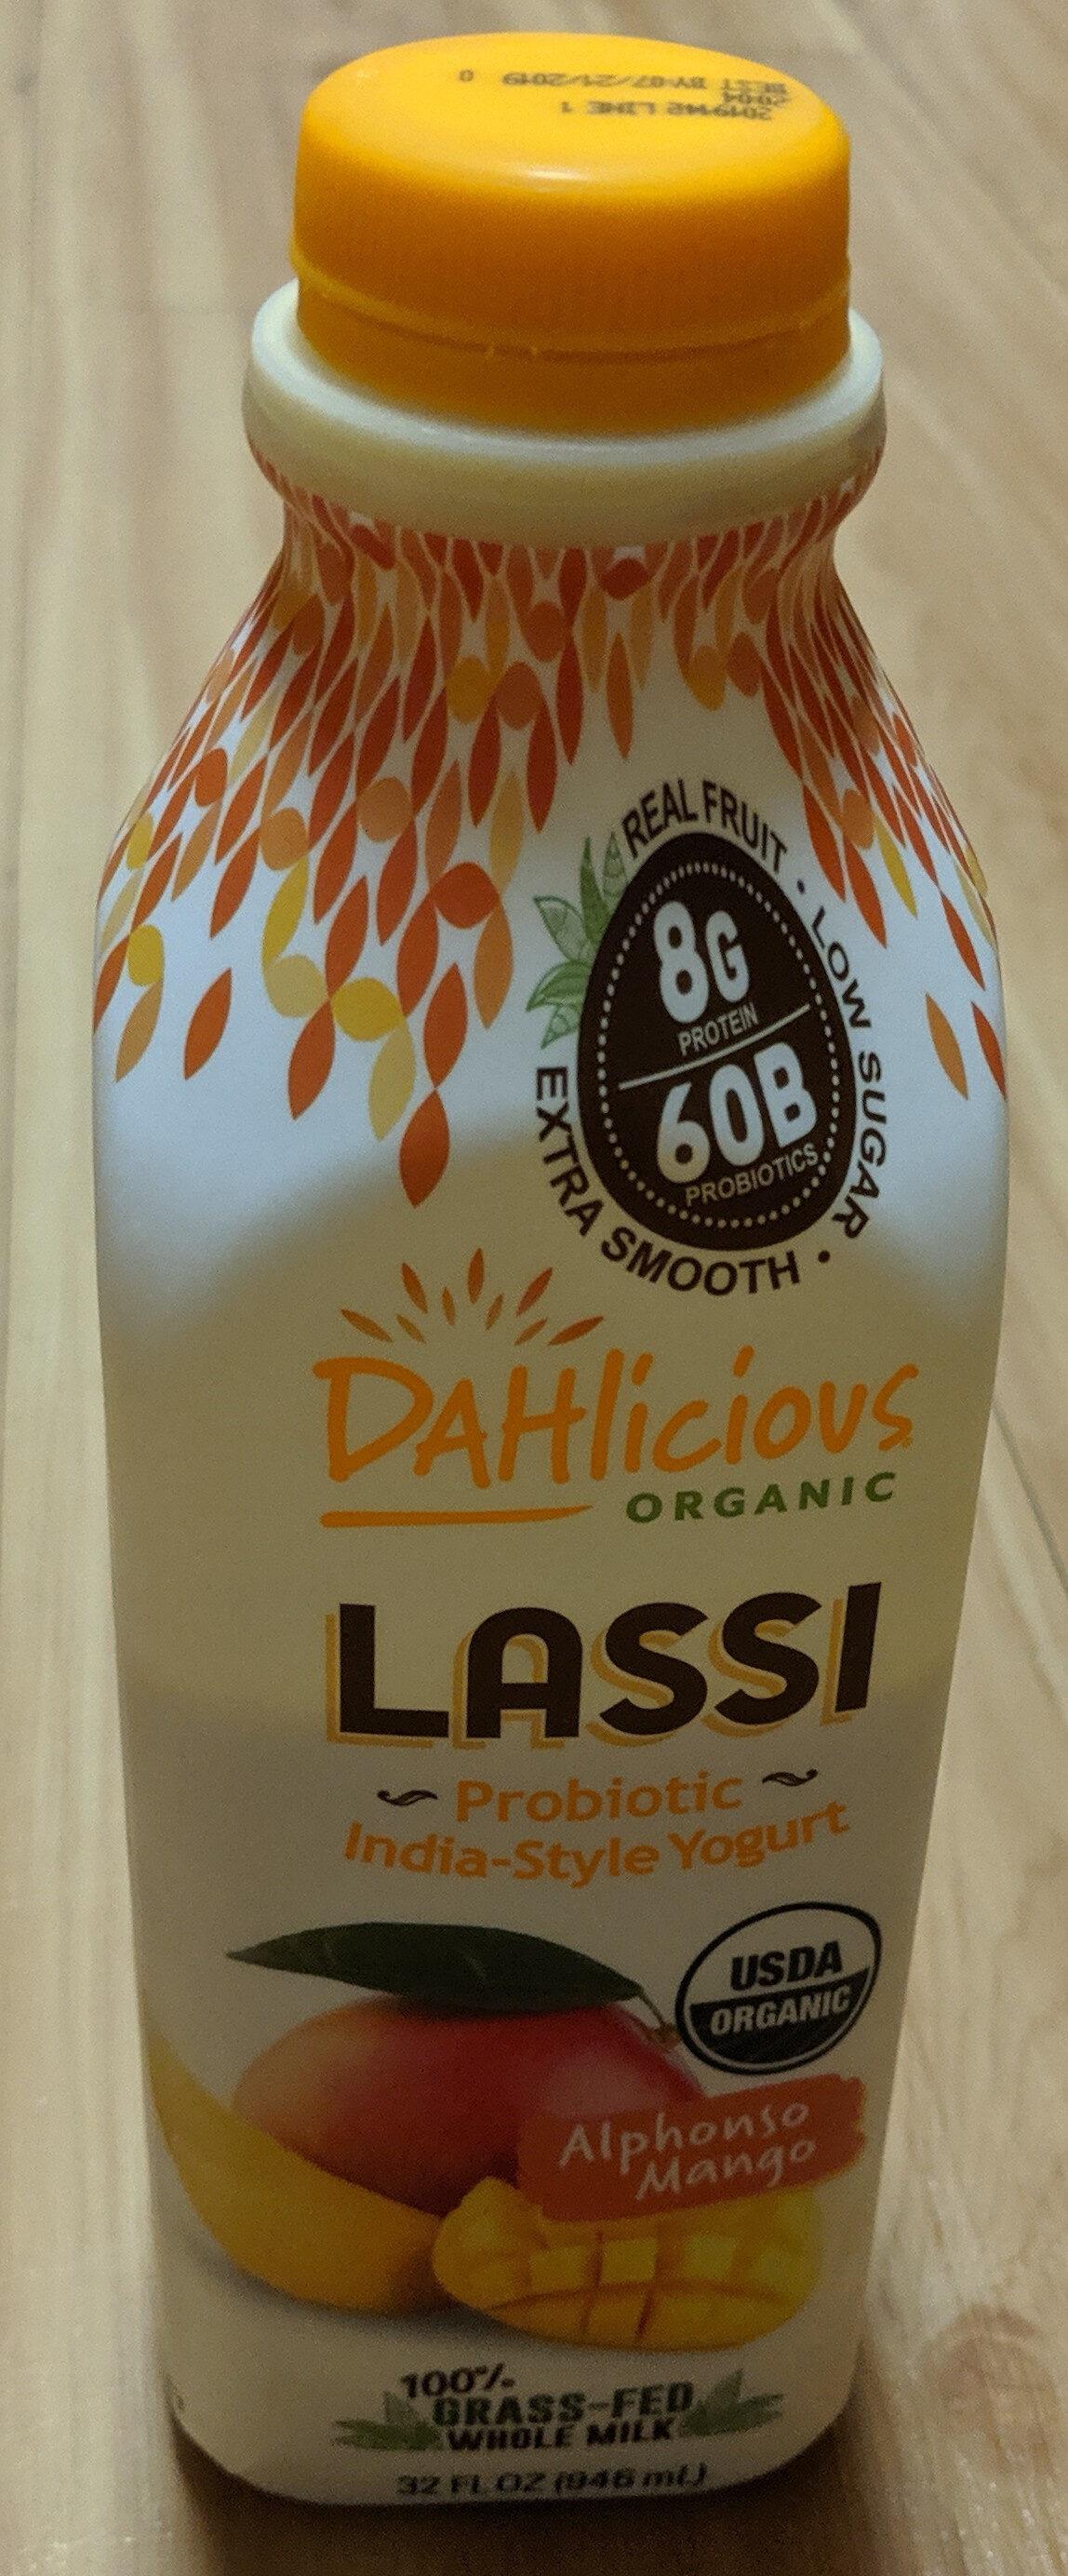 Alphonso mango lassi, alphonso mango - Product - en